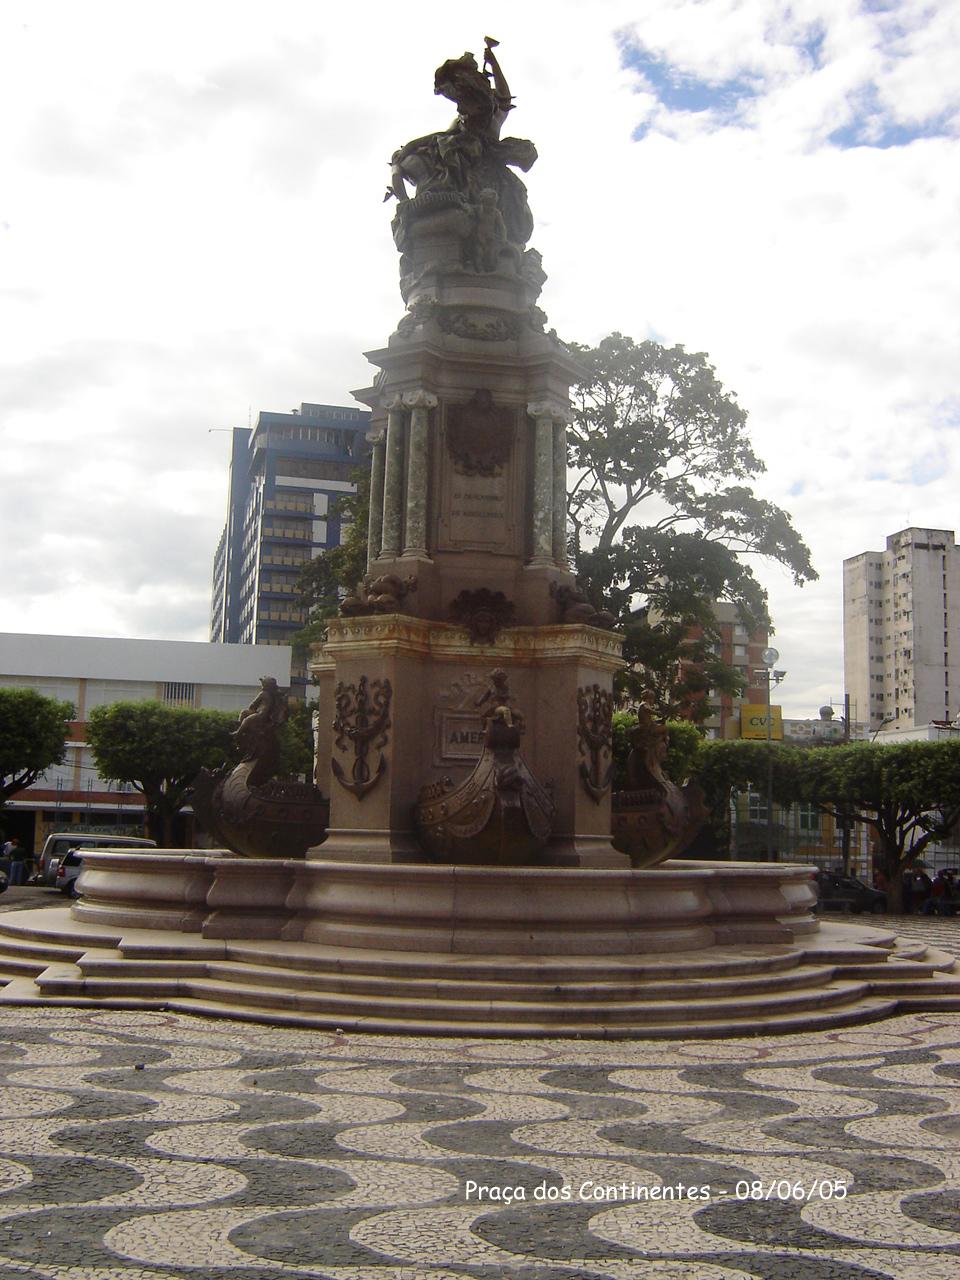 Praça dos Países